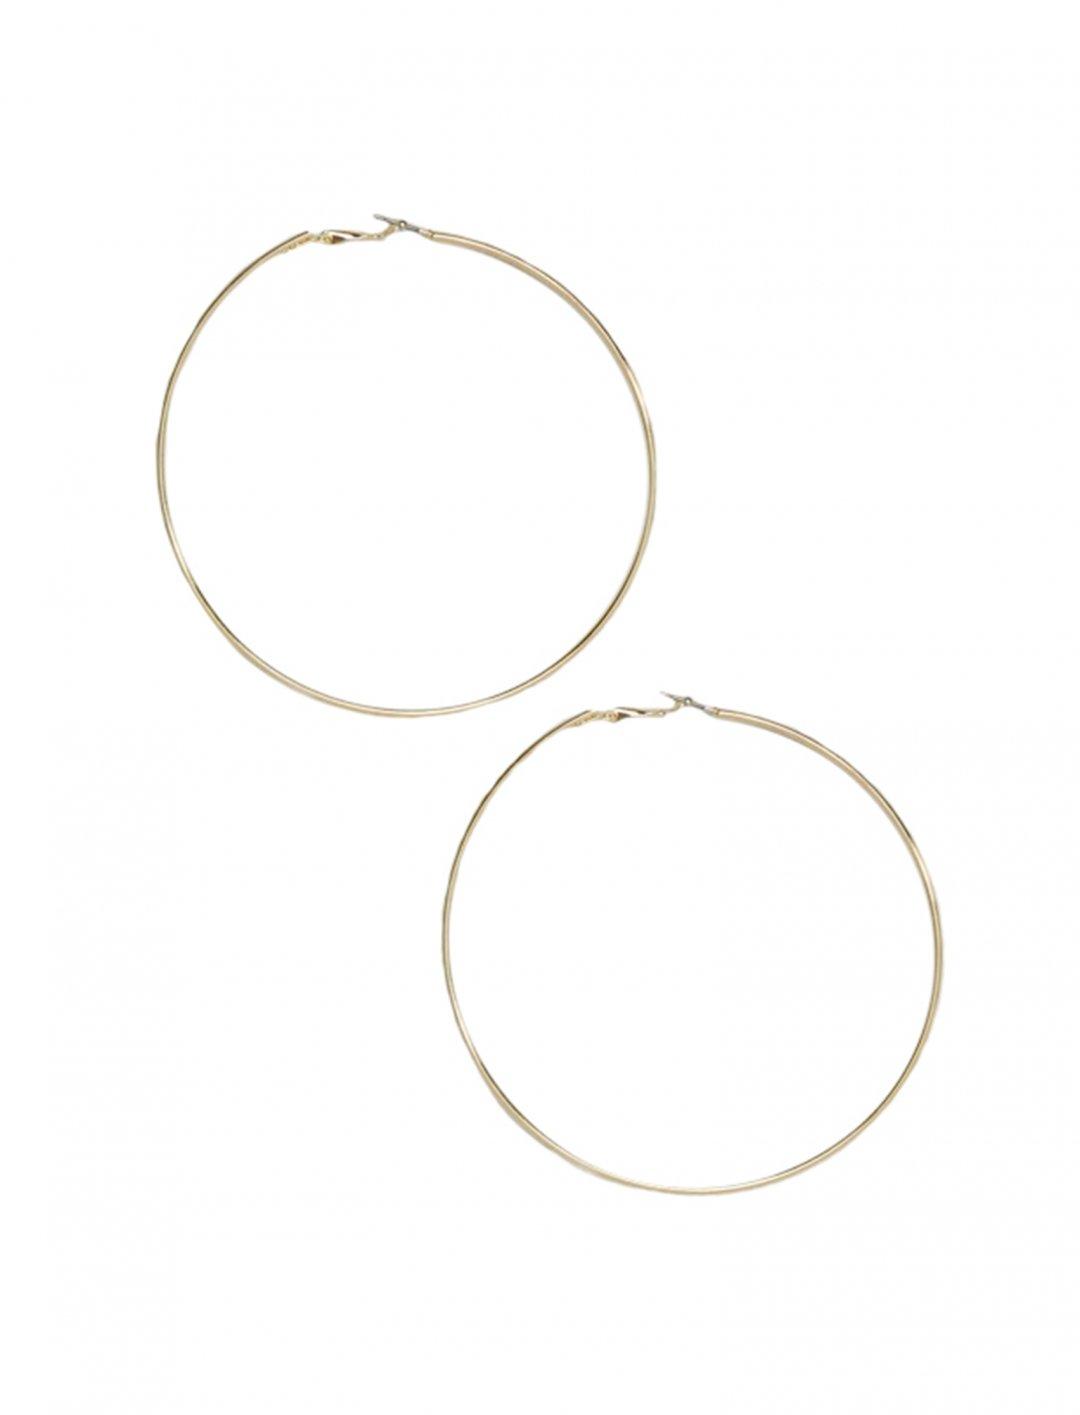 "Nadia Rose's Hoop Earrings {""id"":10,""product_section_id"":1,""name"":""Jewellery"",""order"":10} Liars & Lovers"